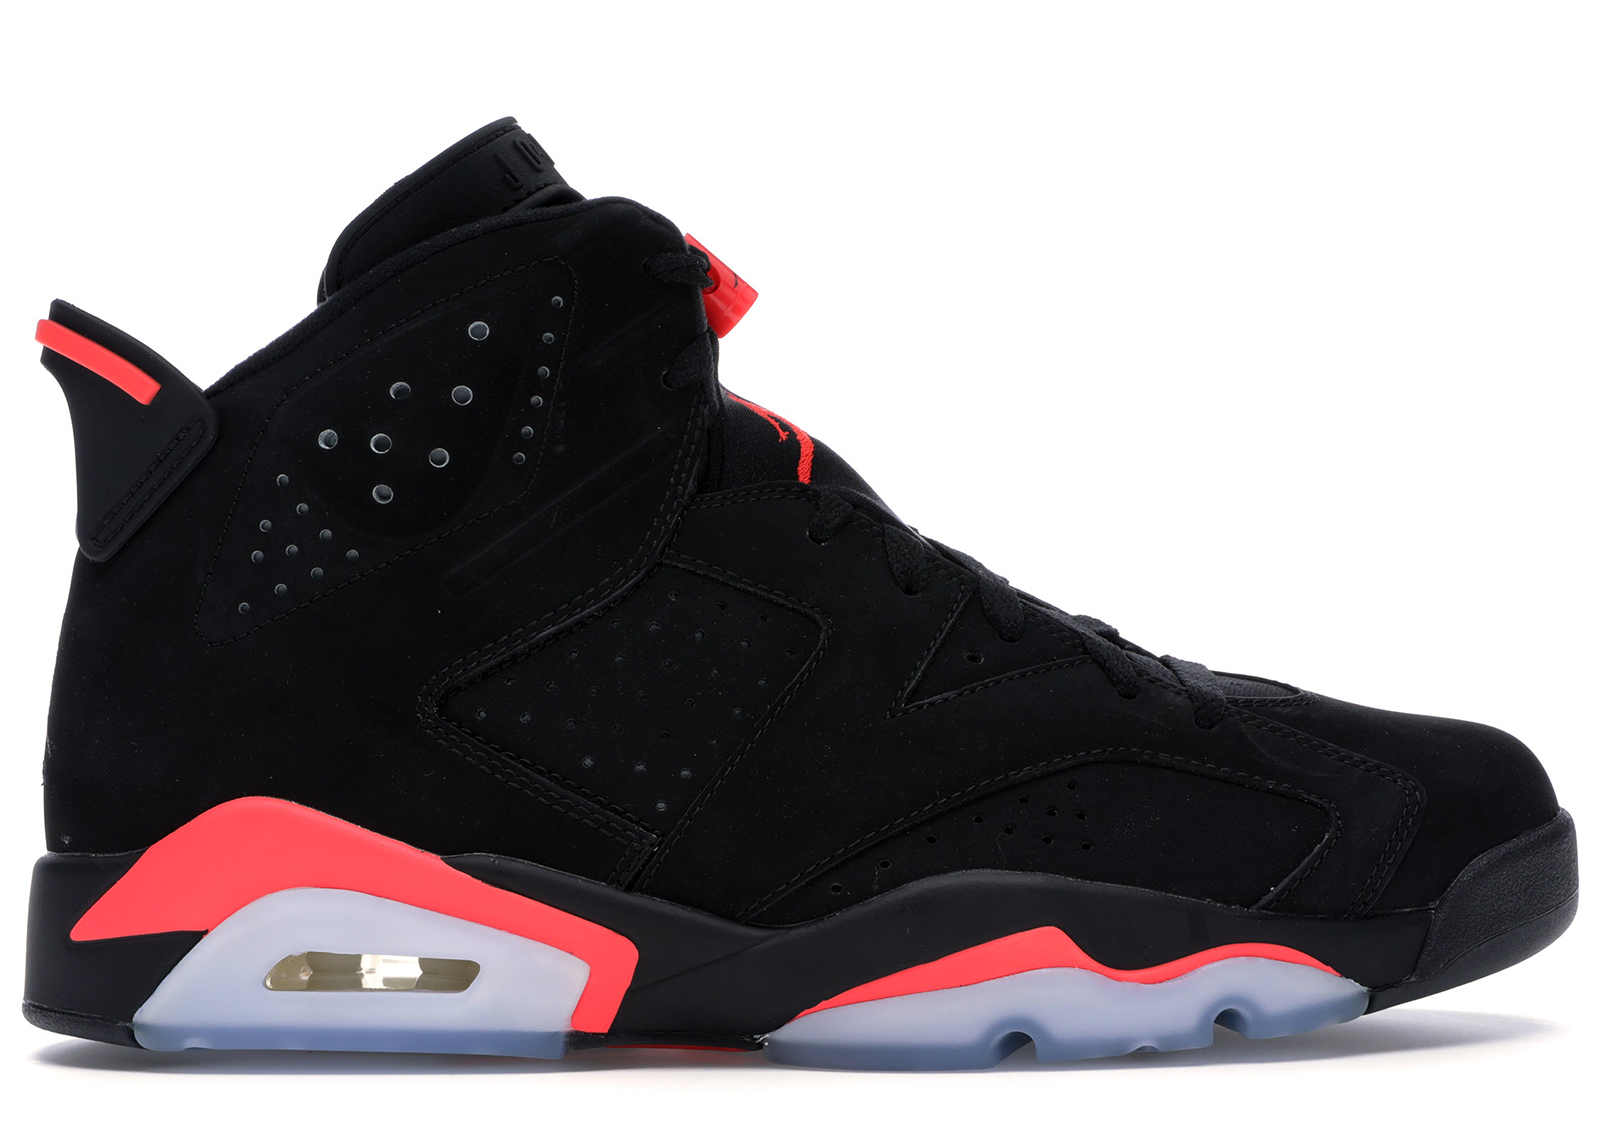 Jordan 6 Retro Infrared Black (2014